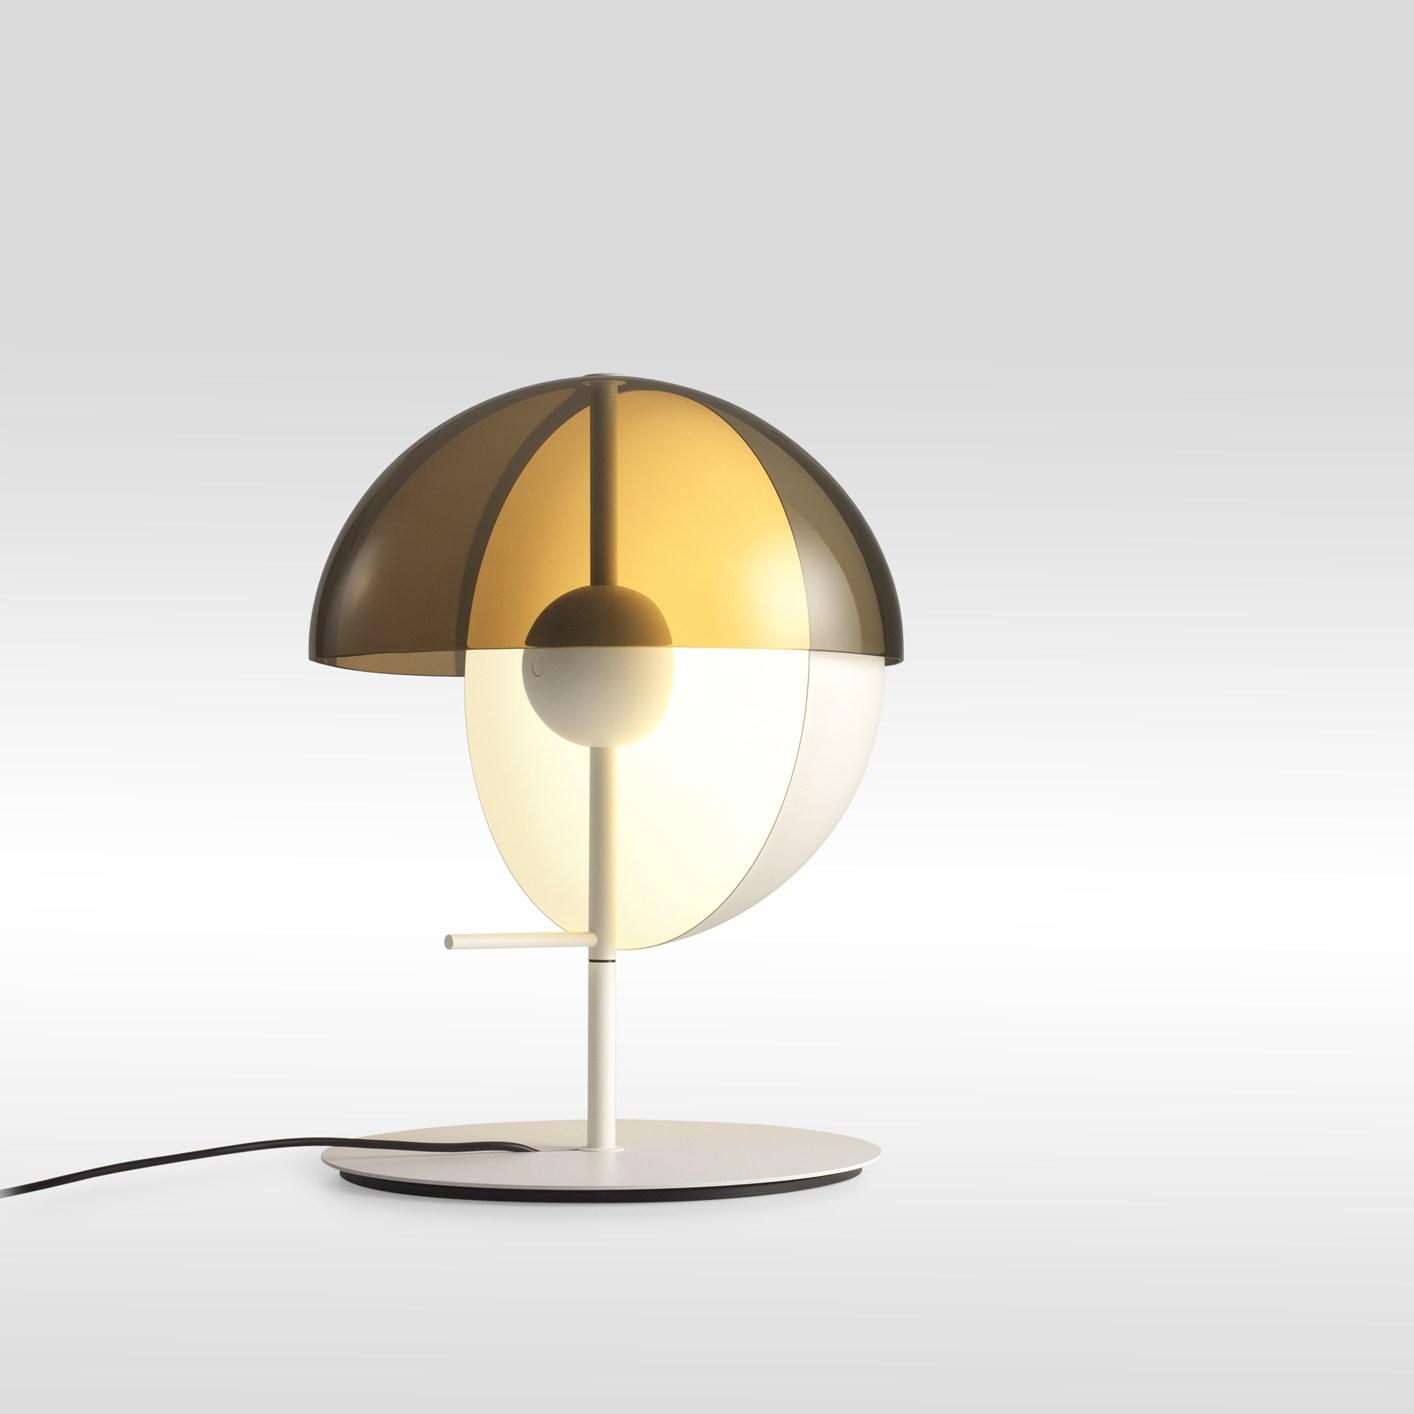 Theia Lamp by Mathias Hahn for Marset.